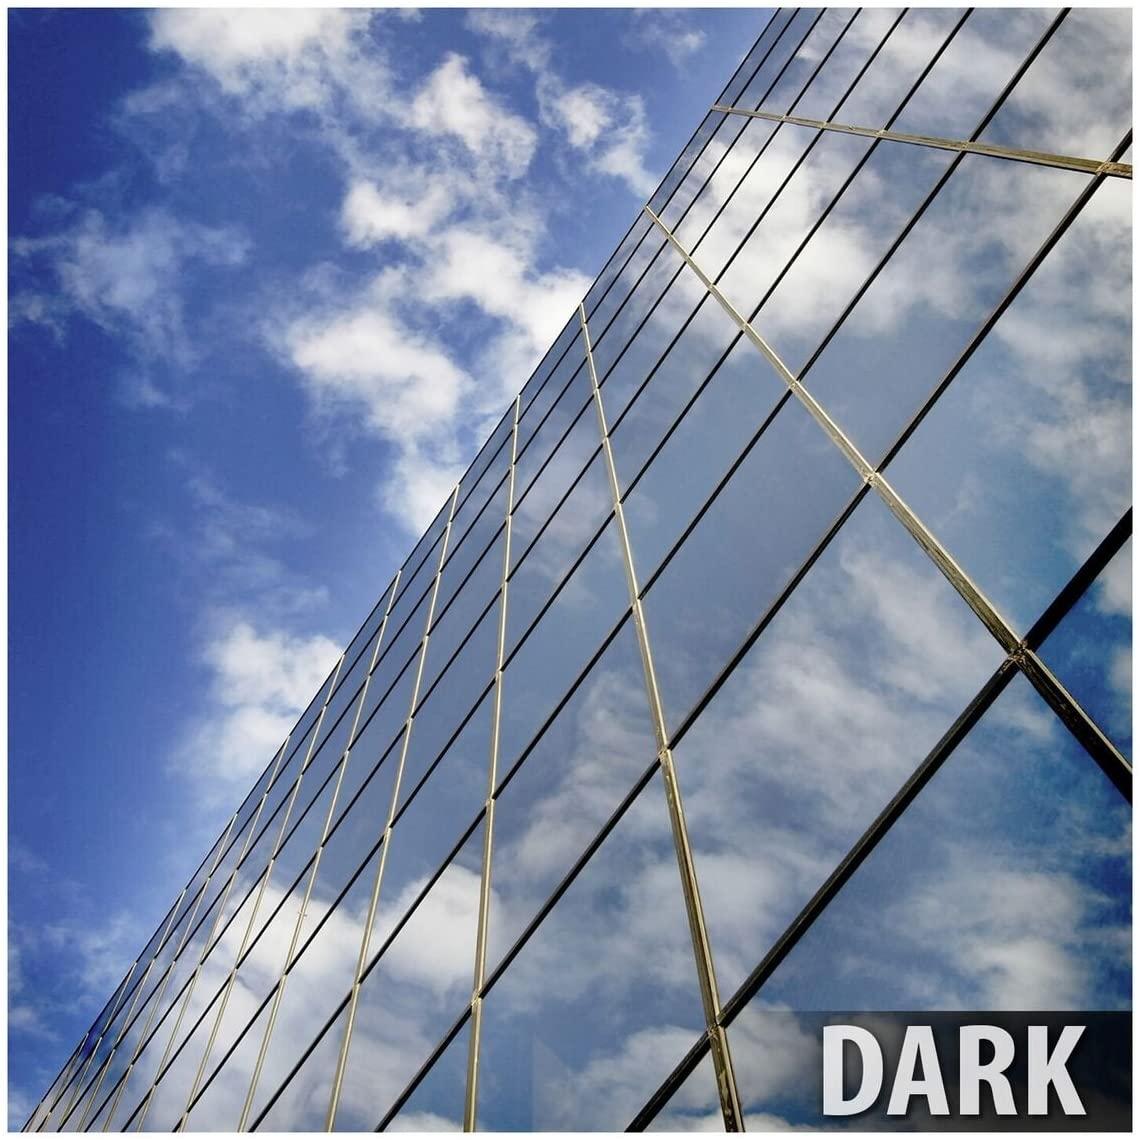 BDF RPRGY Window Film Premium One Way Mirror Privacy Silver/Gray (Very Dark) - 24in X 50ft